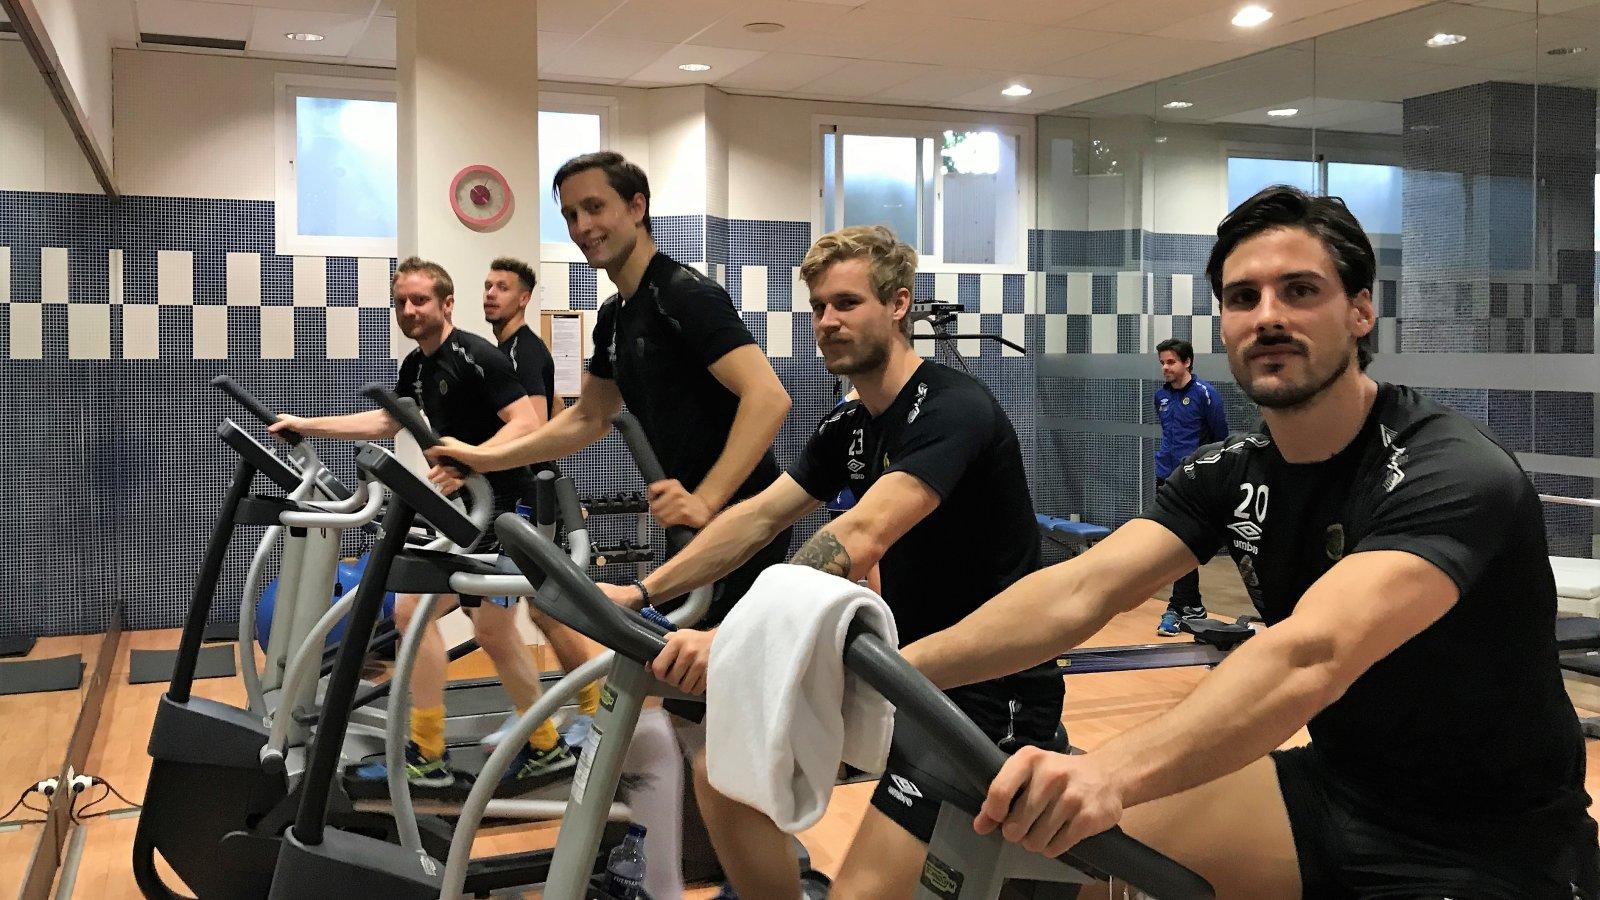 Emmanuel Troudart, Jan Tore Amundsen, Alexander Vangen, Mats-Andre Kaland og Morten Sundli, Marbella 2018.